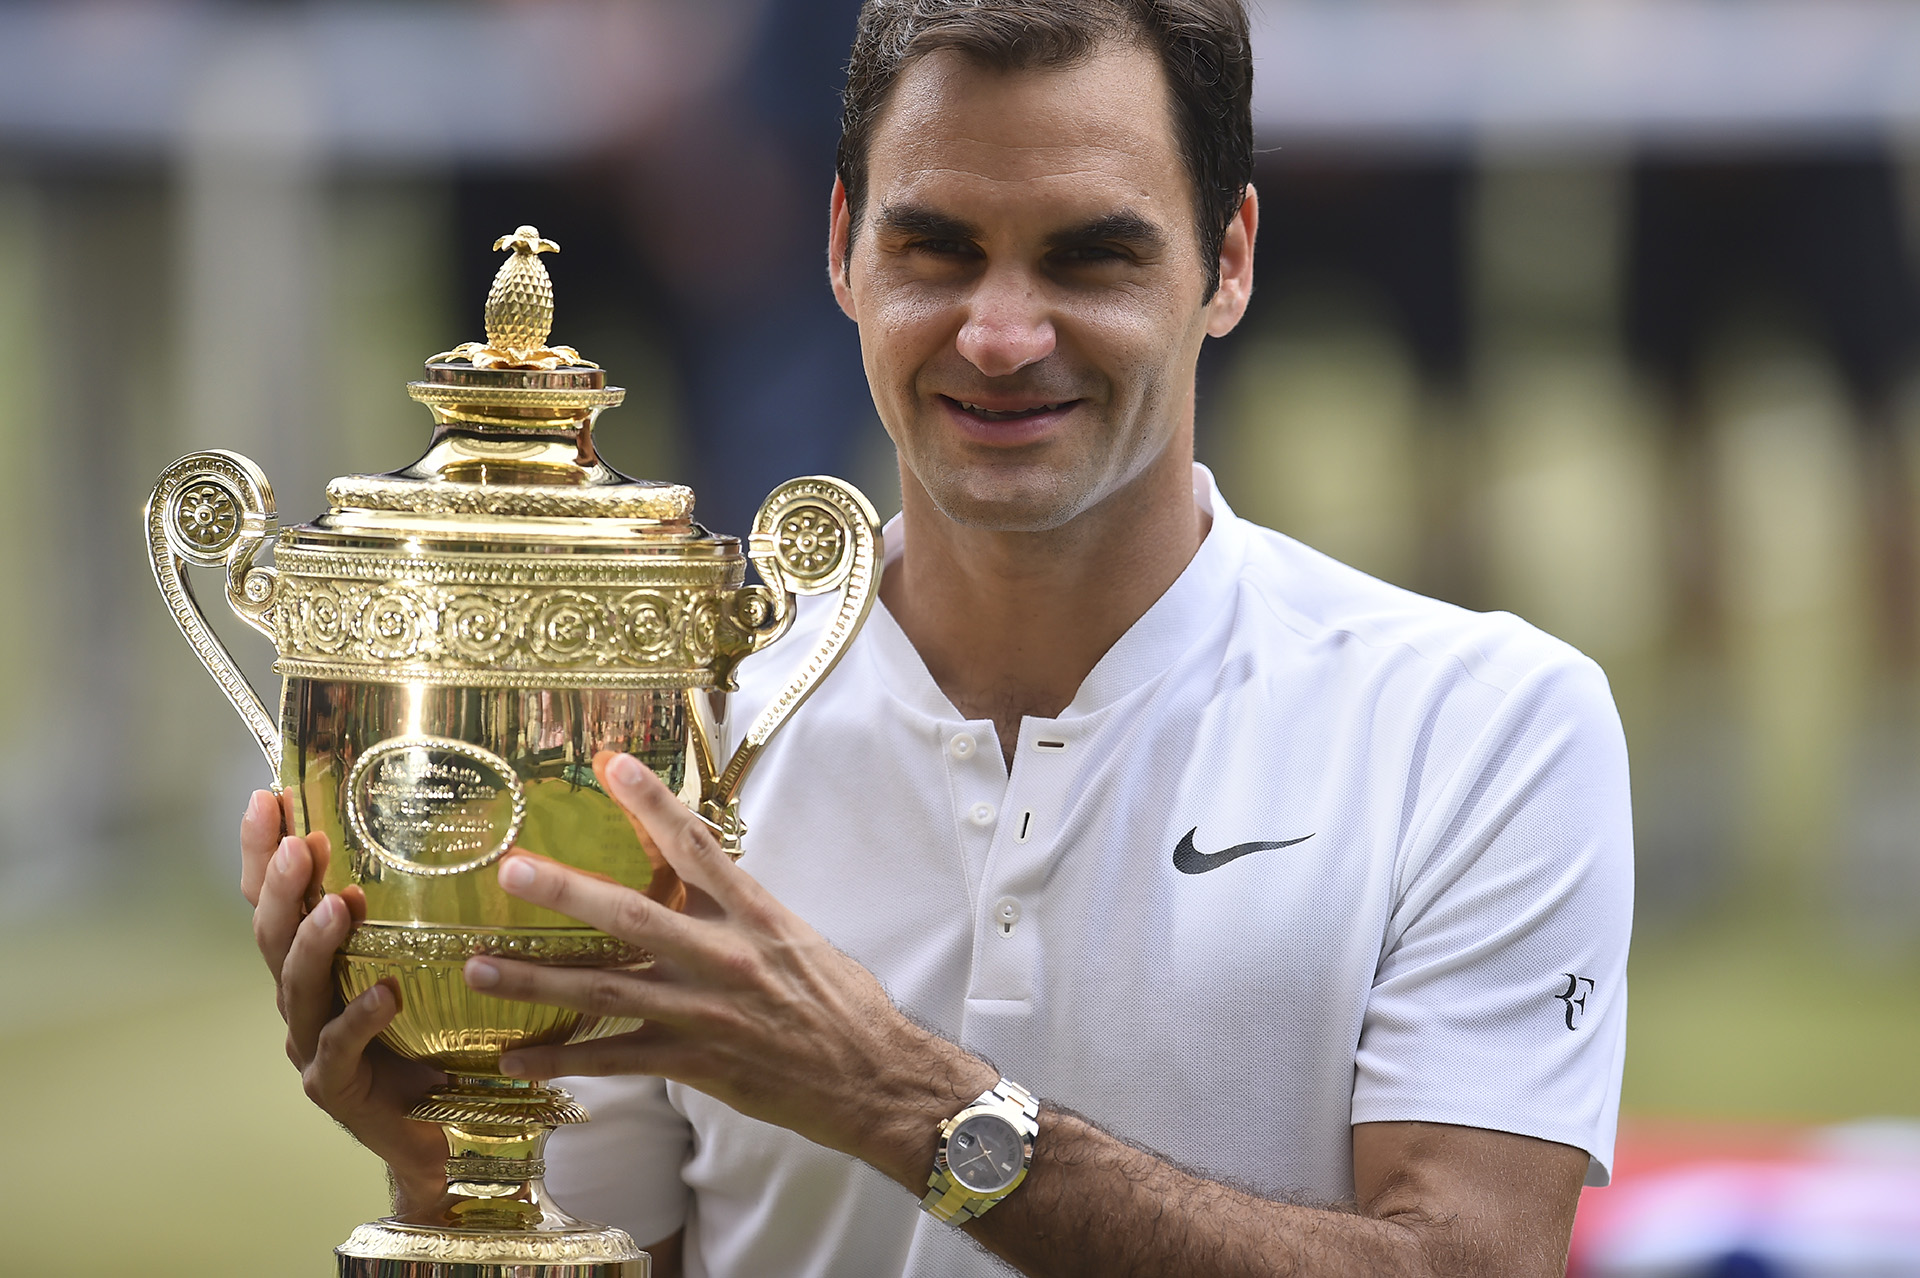 Con el octavo Wimbledon, Roger Federer conquistóel19° Grand Slam de su carrera (AFP PHOTO)